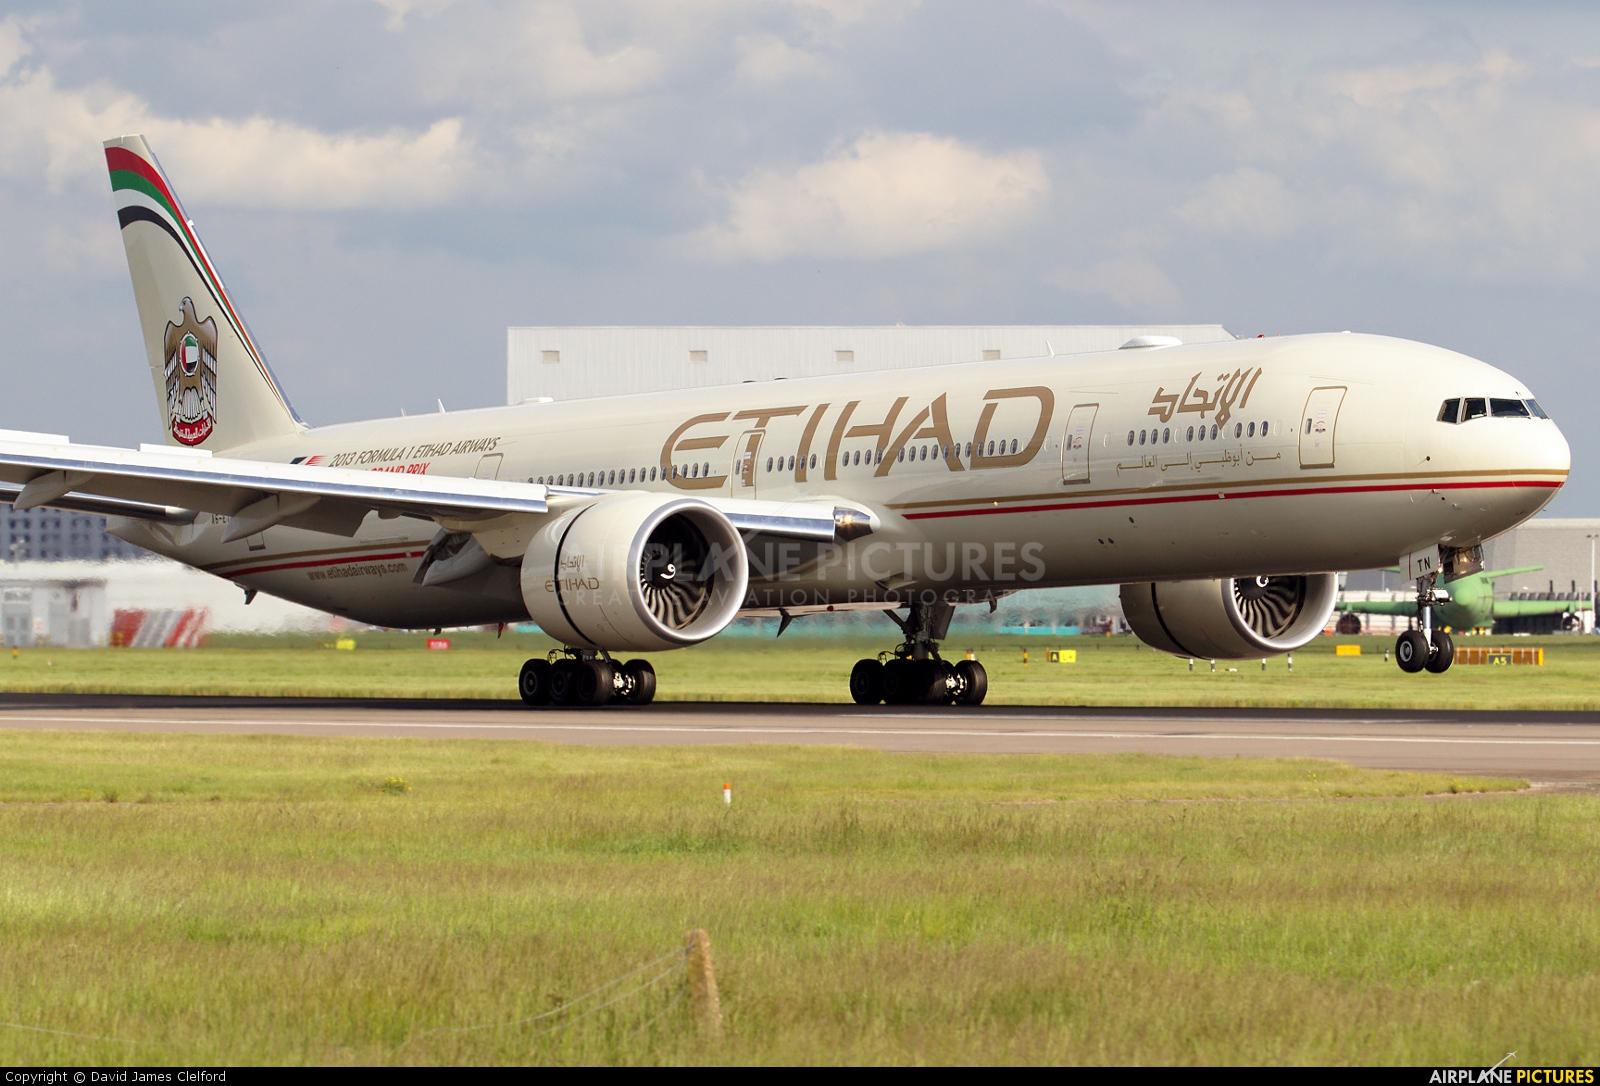 Etihad Airways A6-ETN aircraft at London - Heathrow